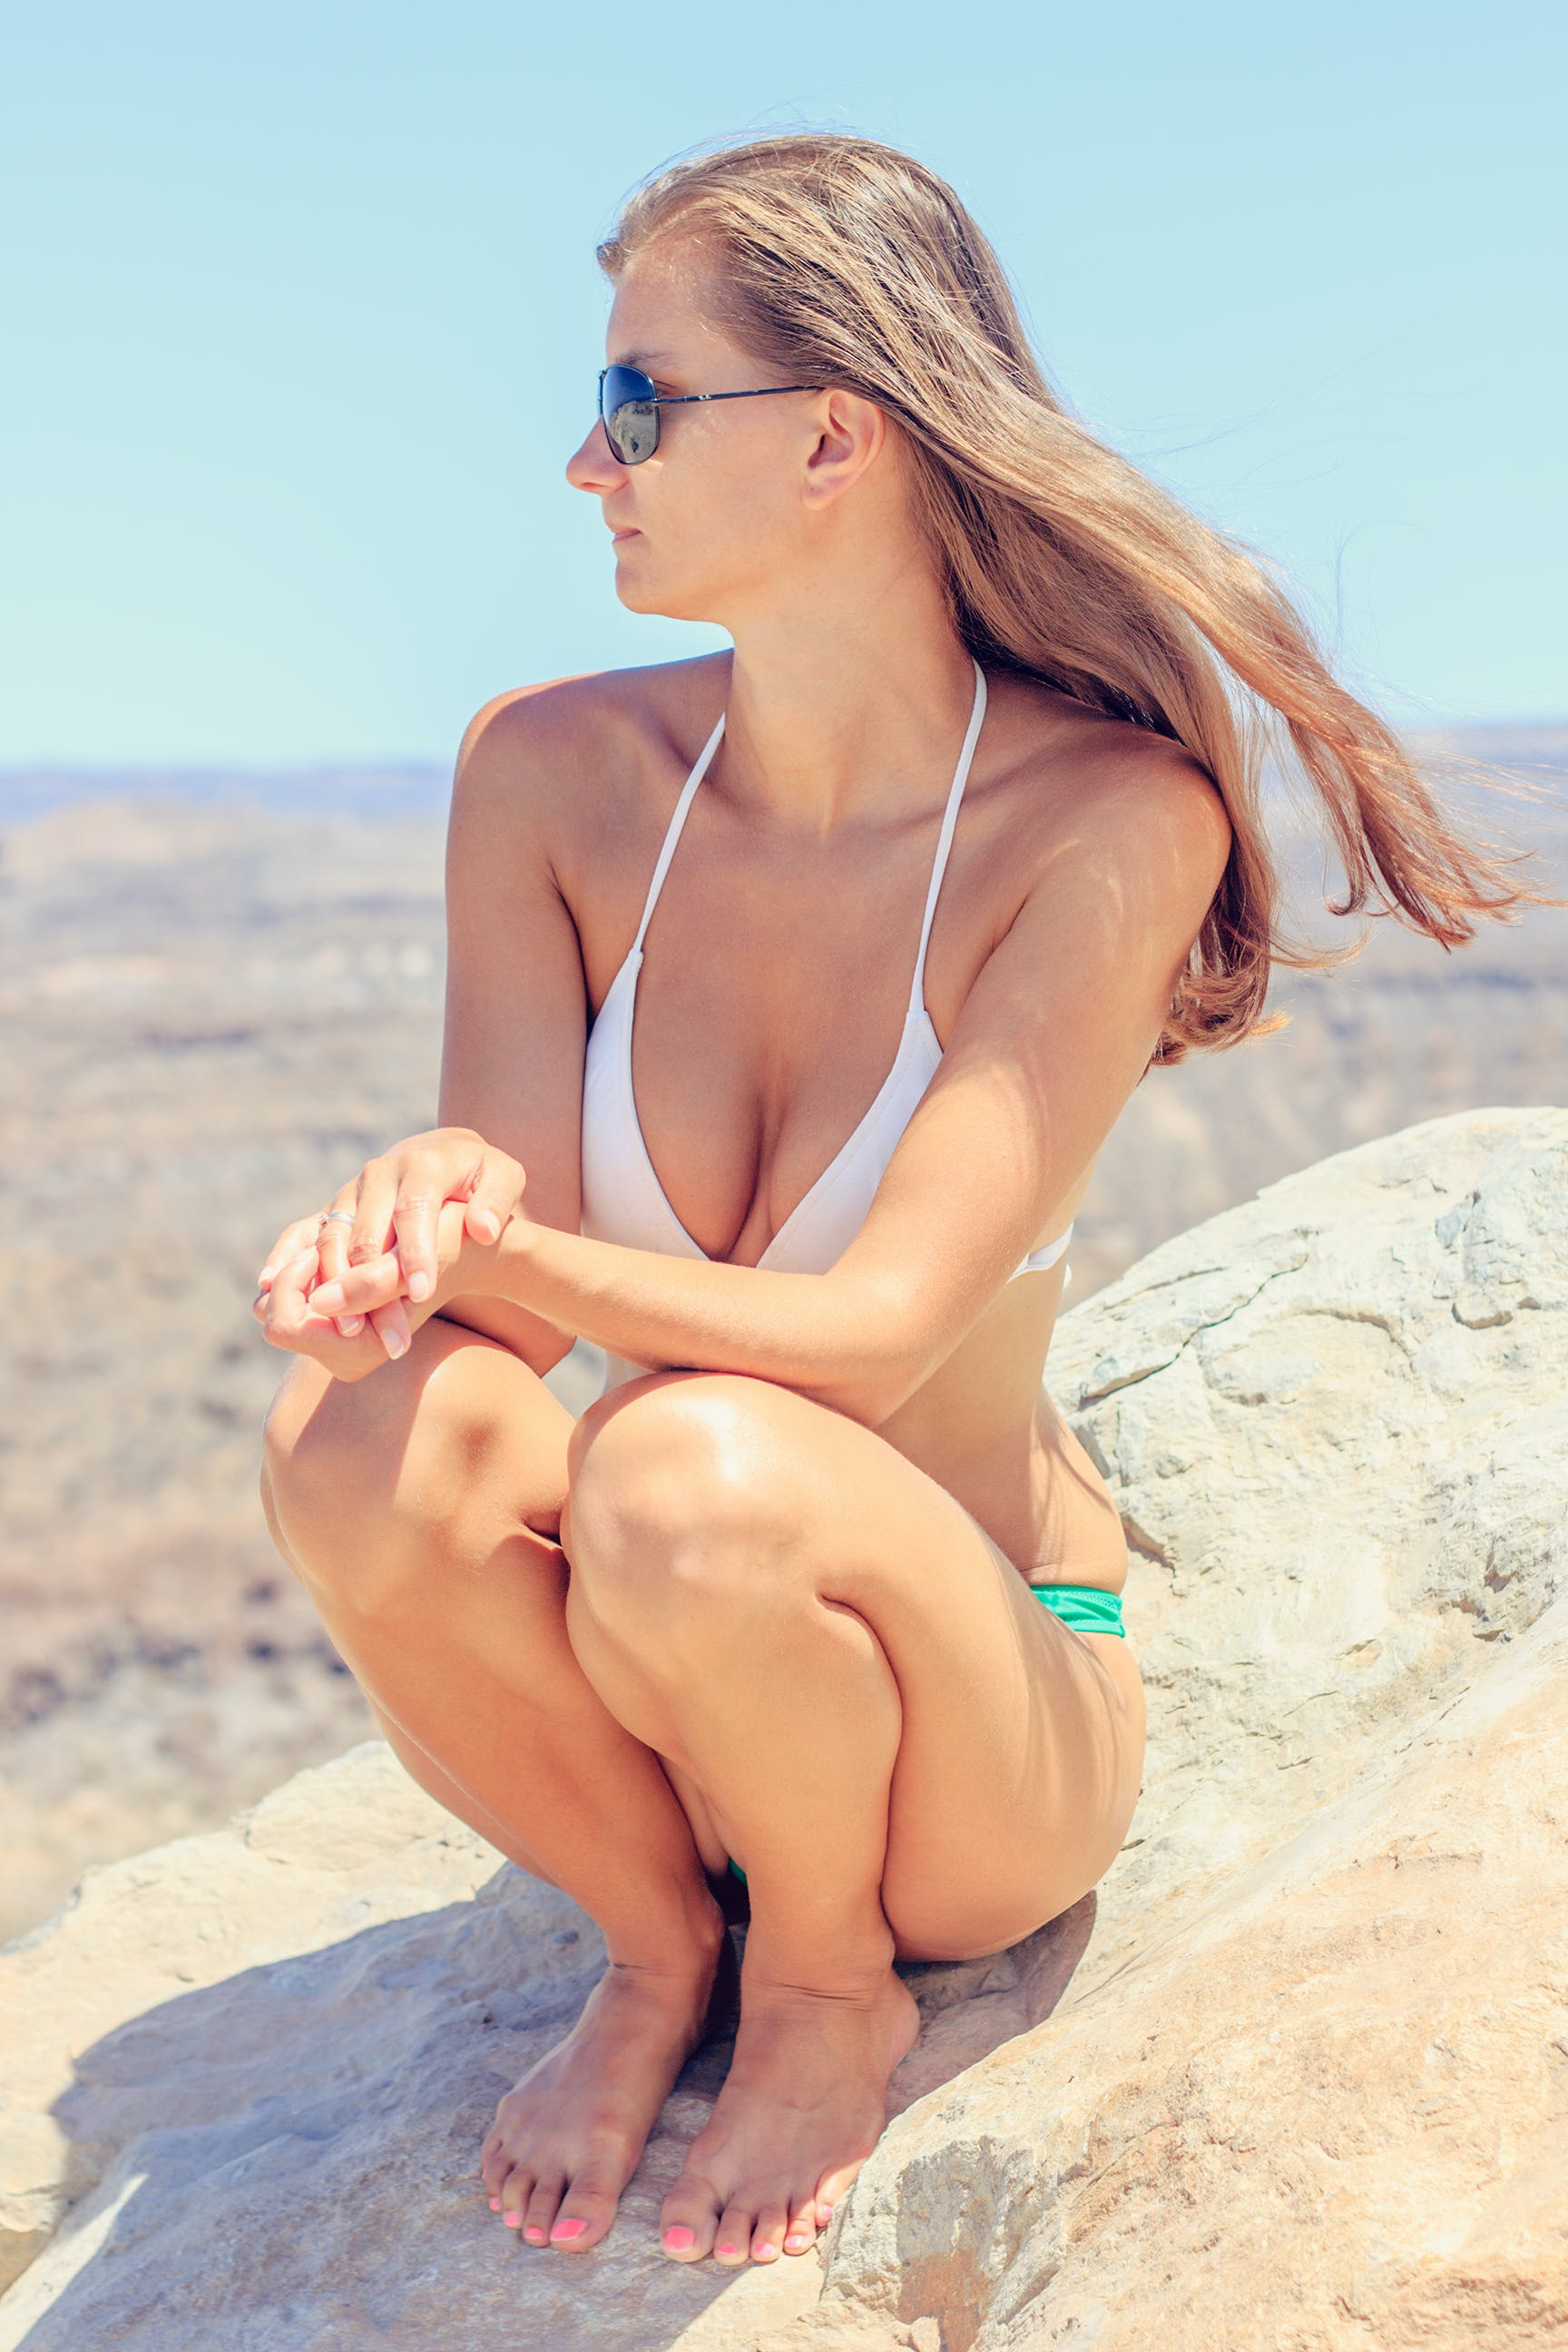 Gratis stockfoto met bikini, blond haar, haar, hemel